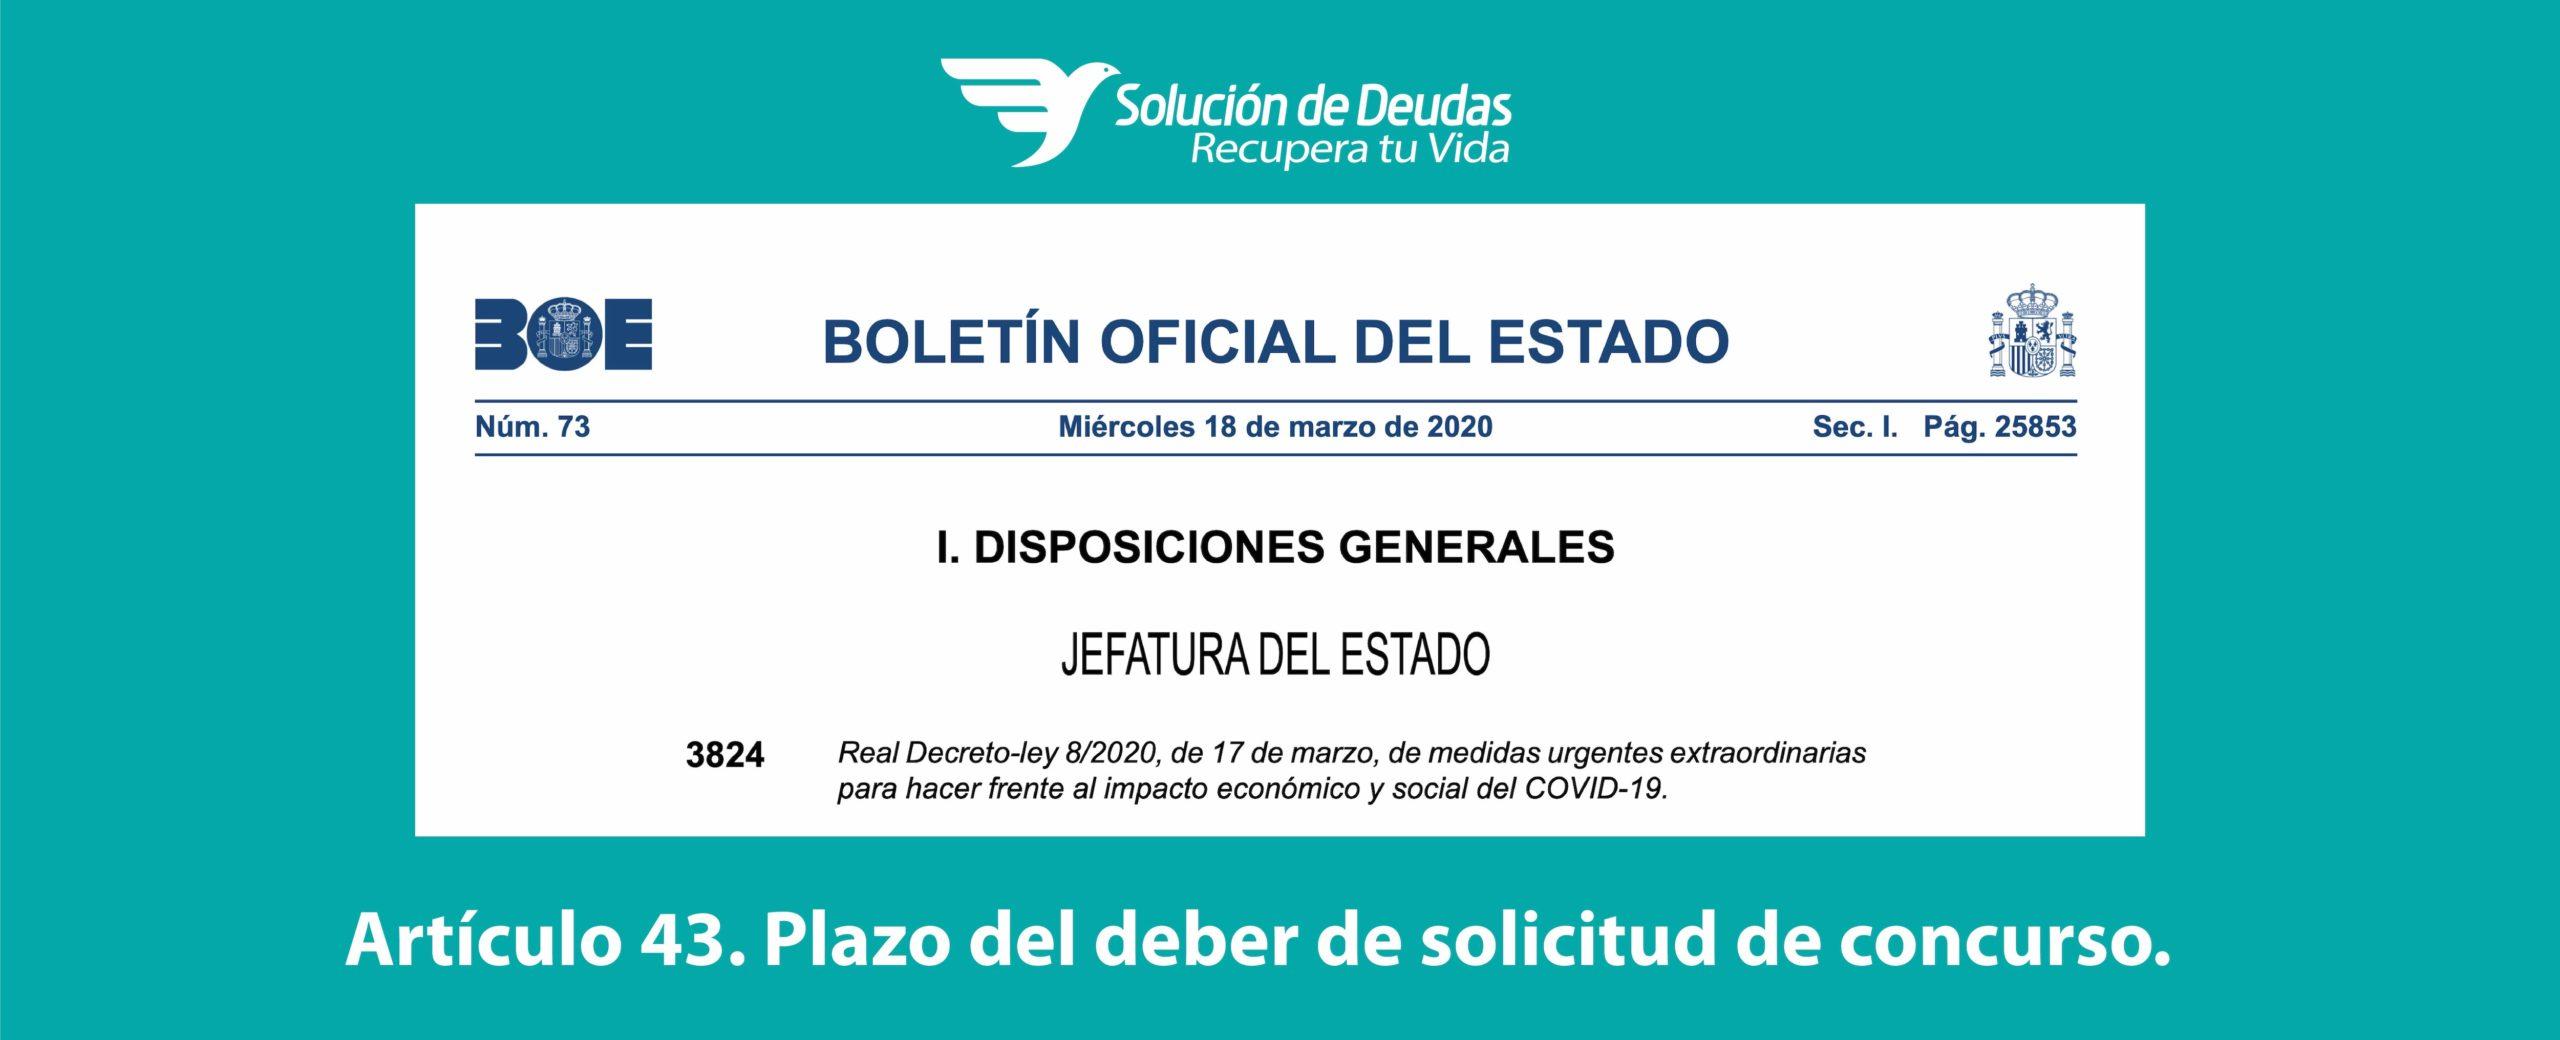 Real Decreto Ley 8/2020 para la crisis del Coronavirus.